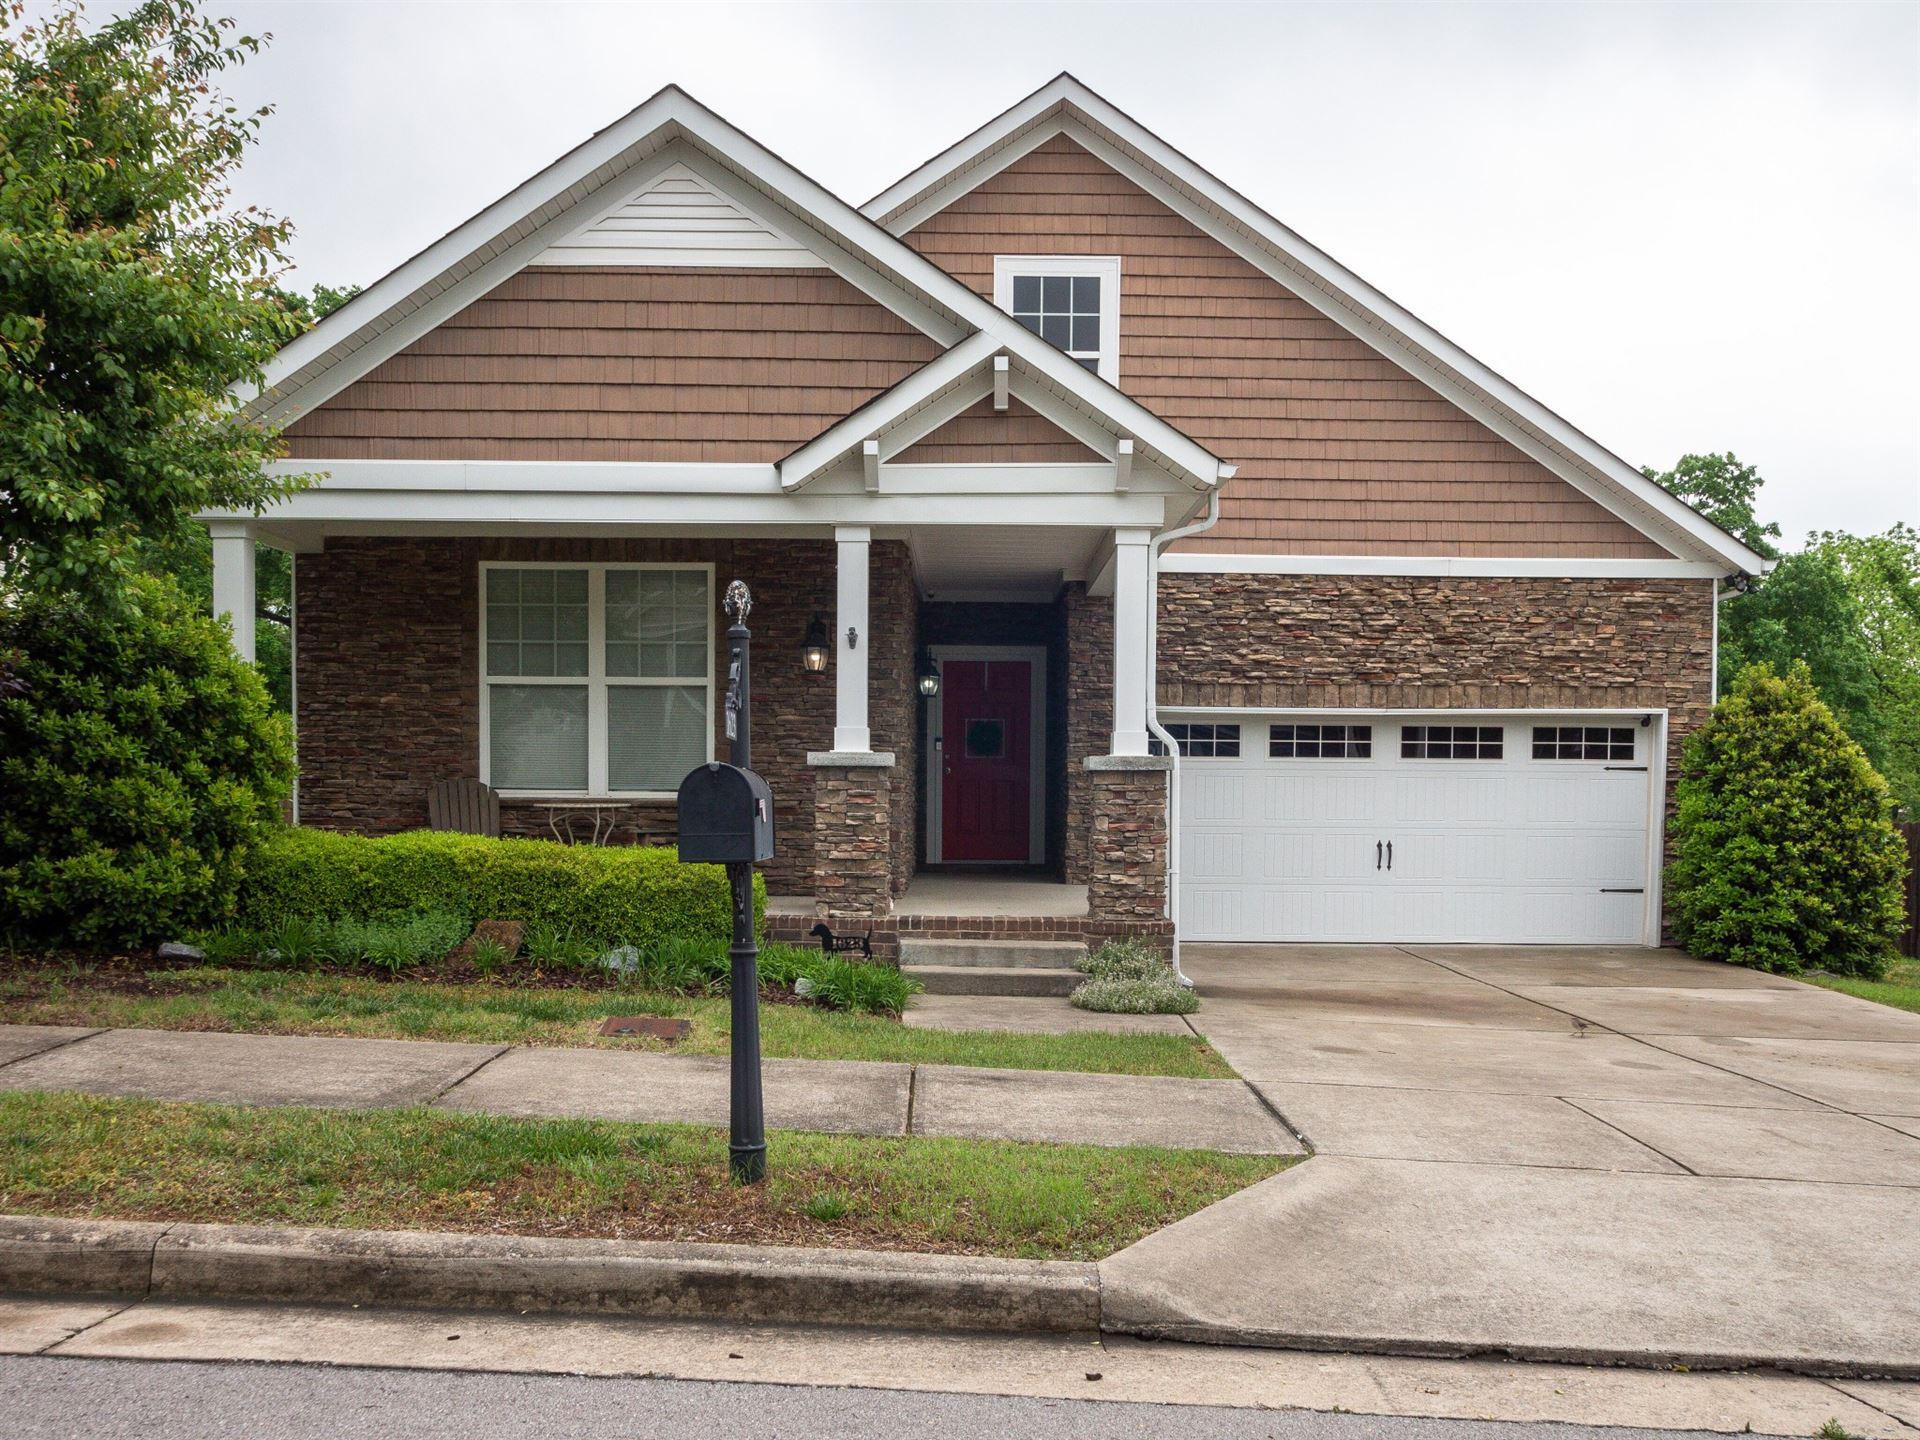 1623 Stonewater Dr, Hermitage, TN 37076 - MLS#: 2251034